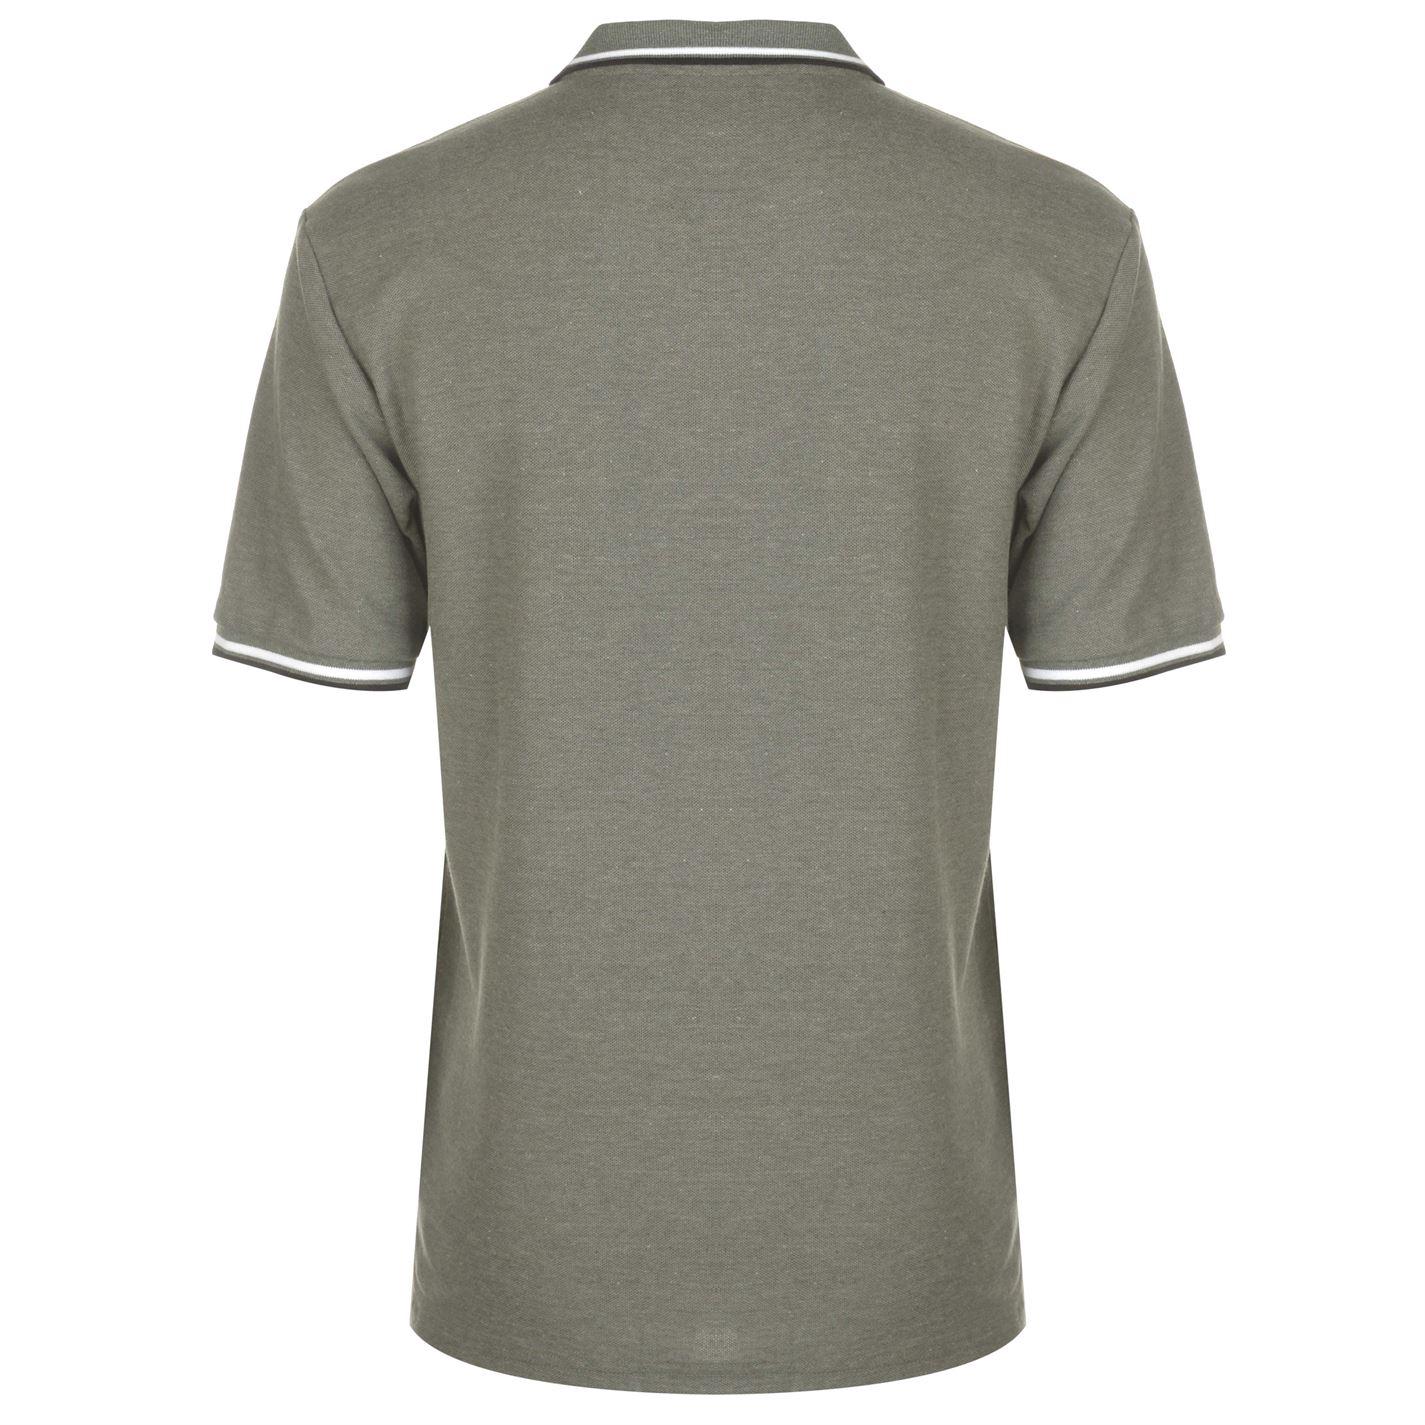 Tricouri Polo Slazenger Tipped pentru Barbati kaki gri